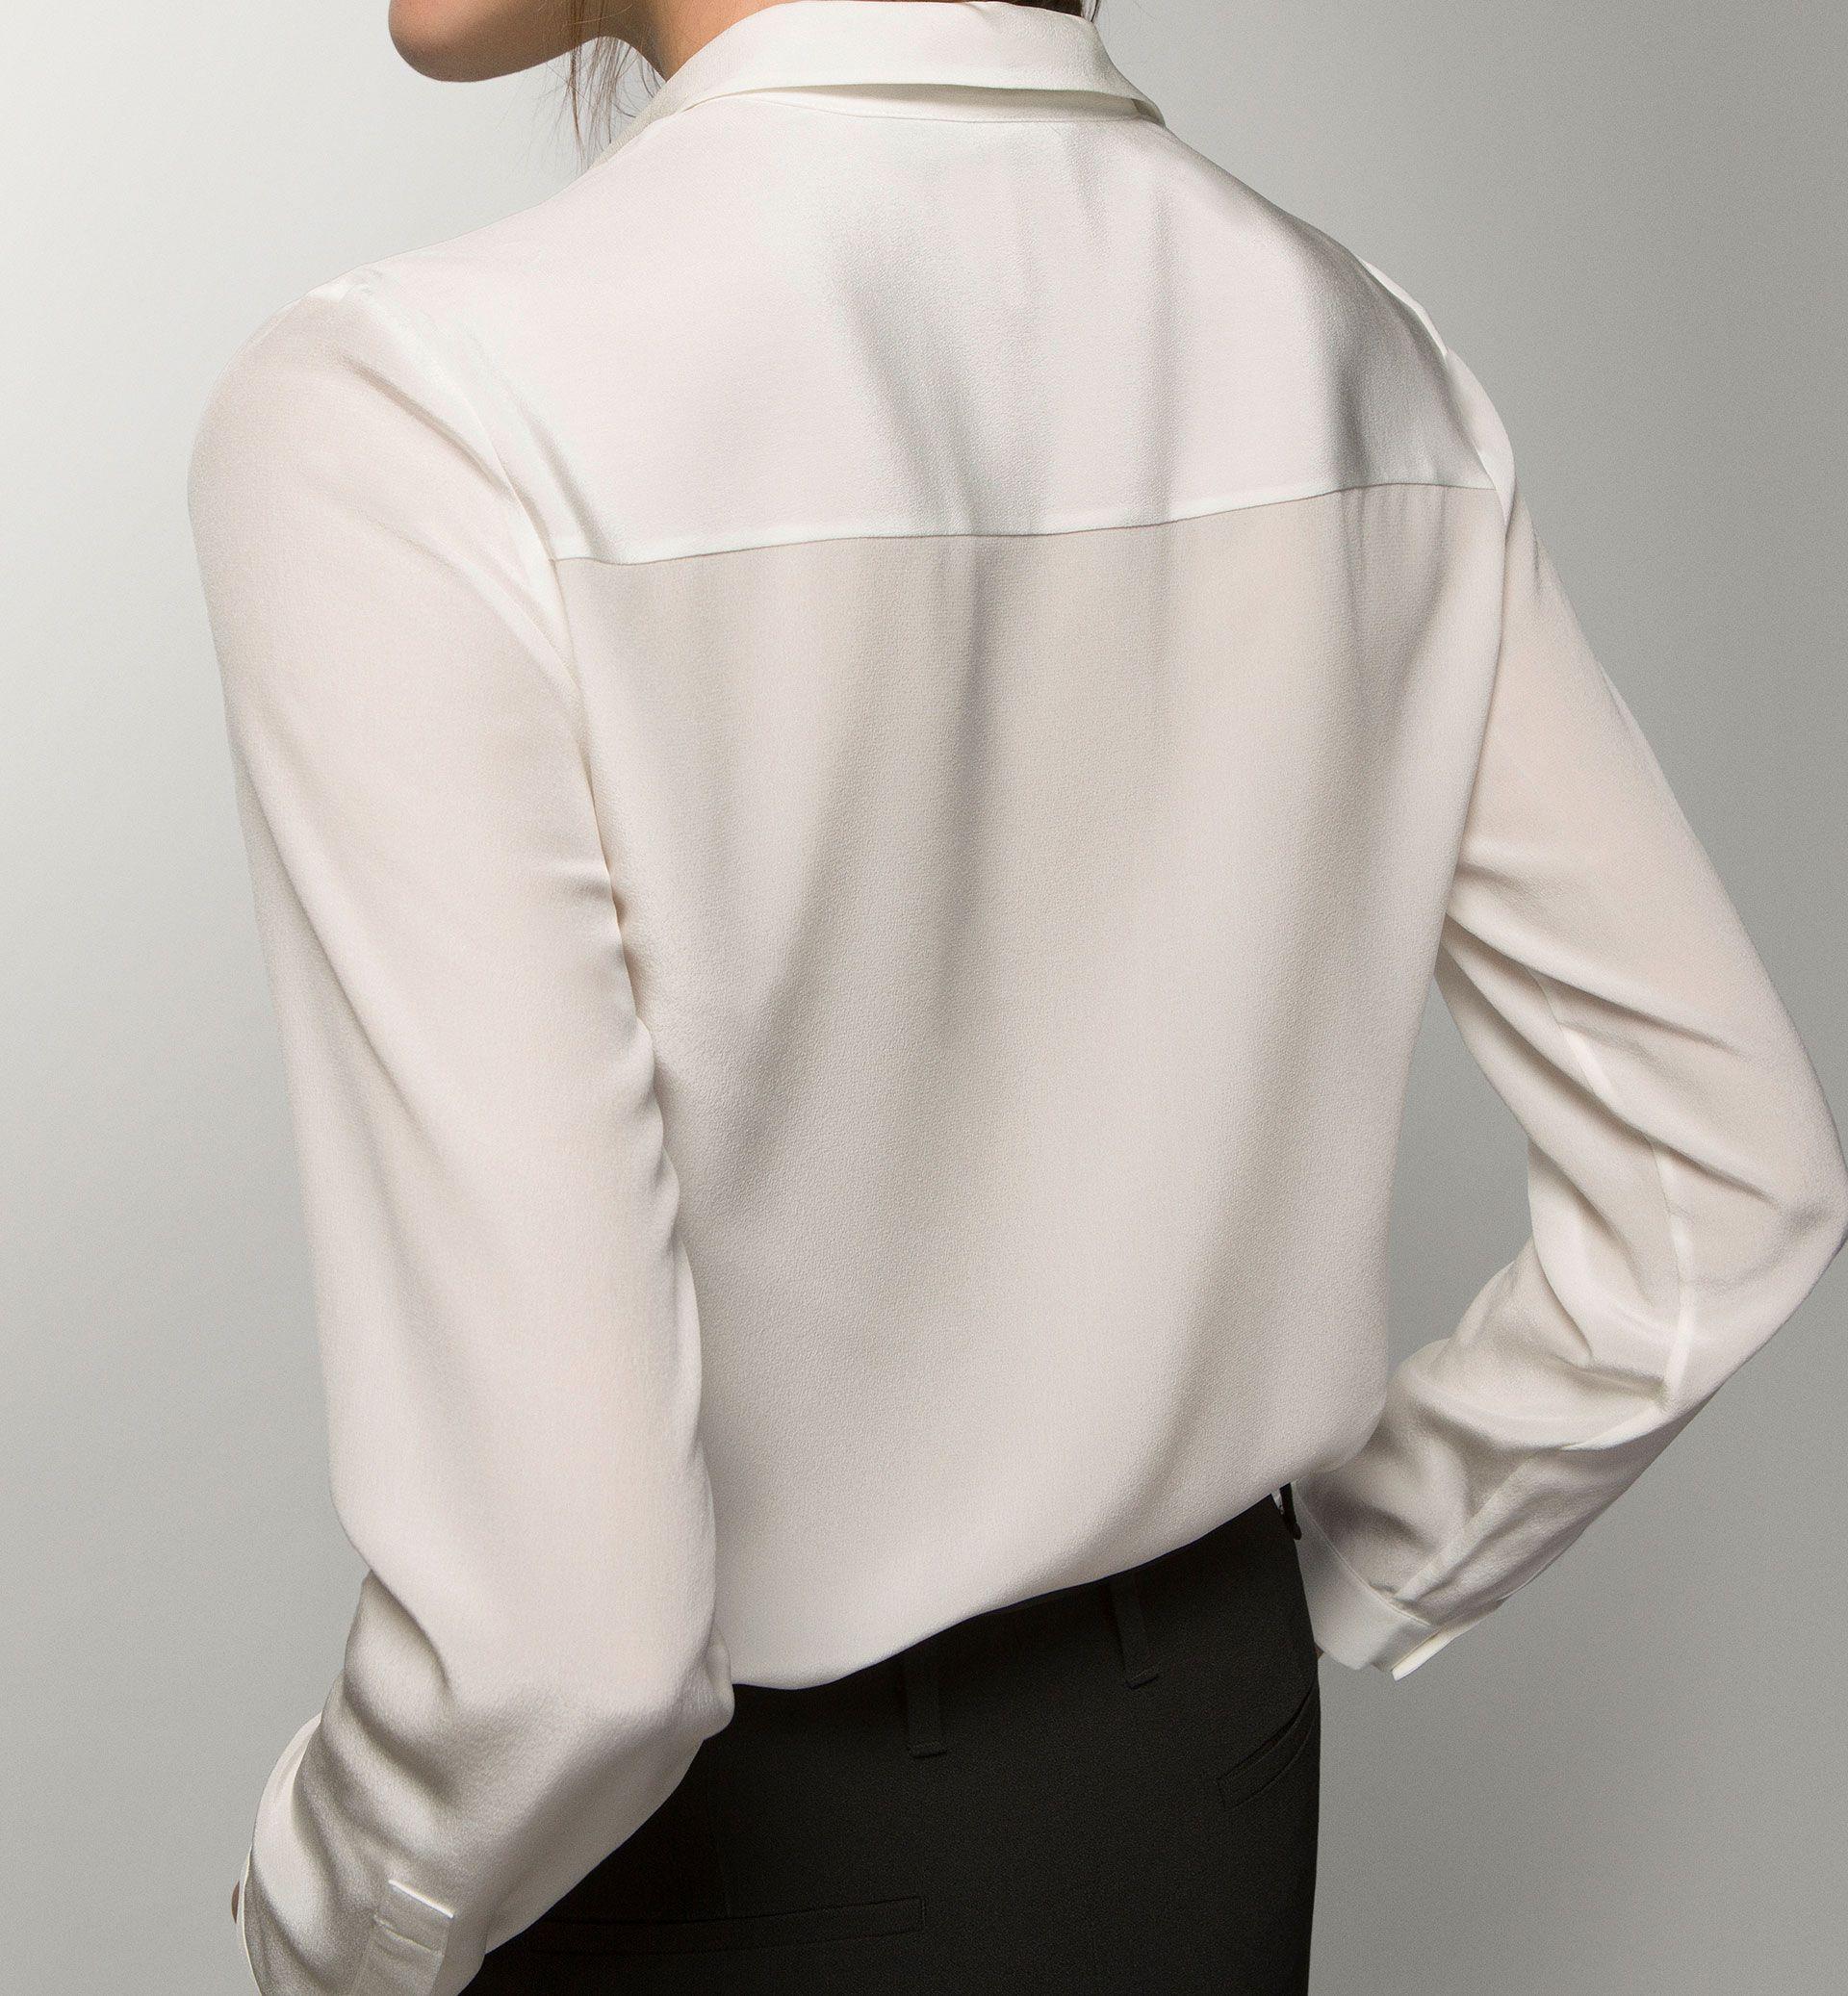 CAMISA BLANCA 100% SEDA   Blusas mujer, Ropa, Camisa blanca